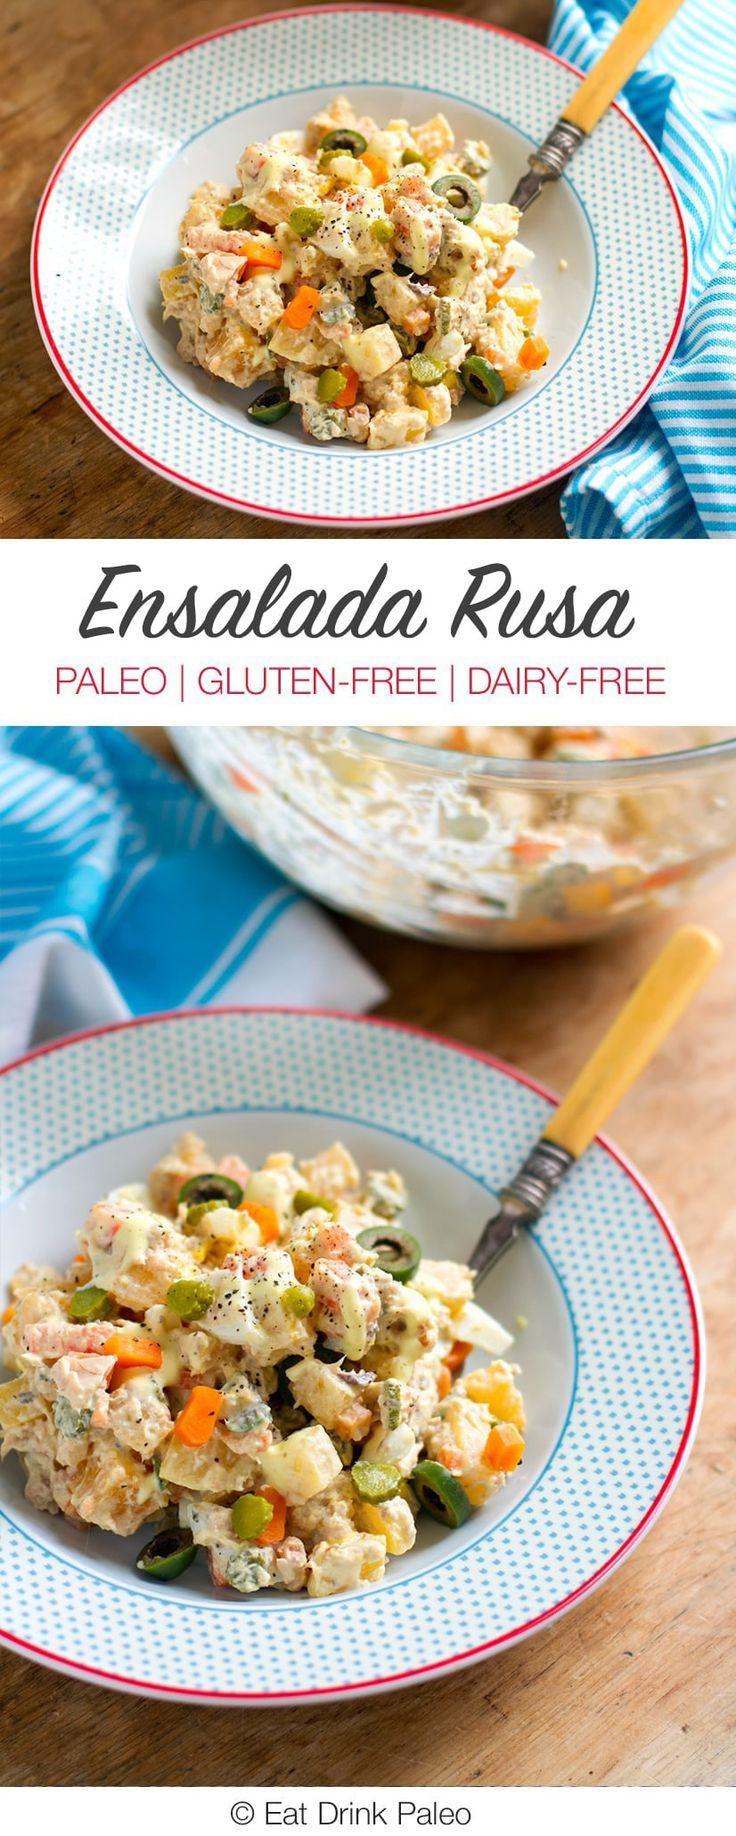 Ensalada Rusa – Spanish Take On A Classic Potato Salad | Paleo, Gluten-free, Dairy-free Recipe http://eatdrinkpaleo.com.au/ensalada-rusa-paleo-potato-tuna-salad/